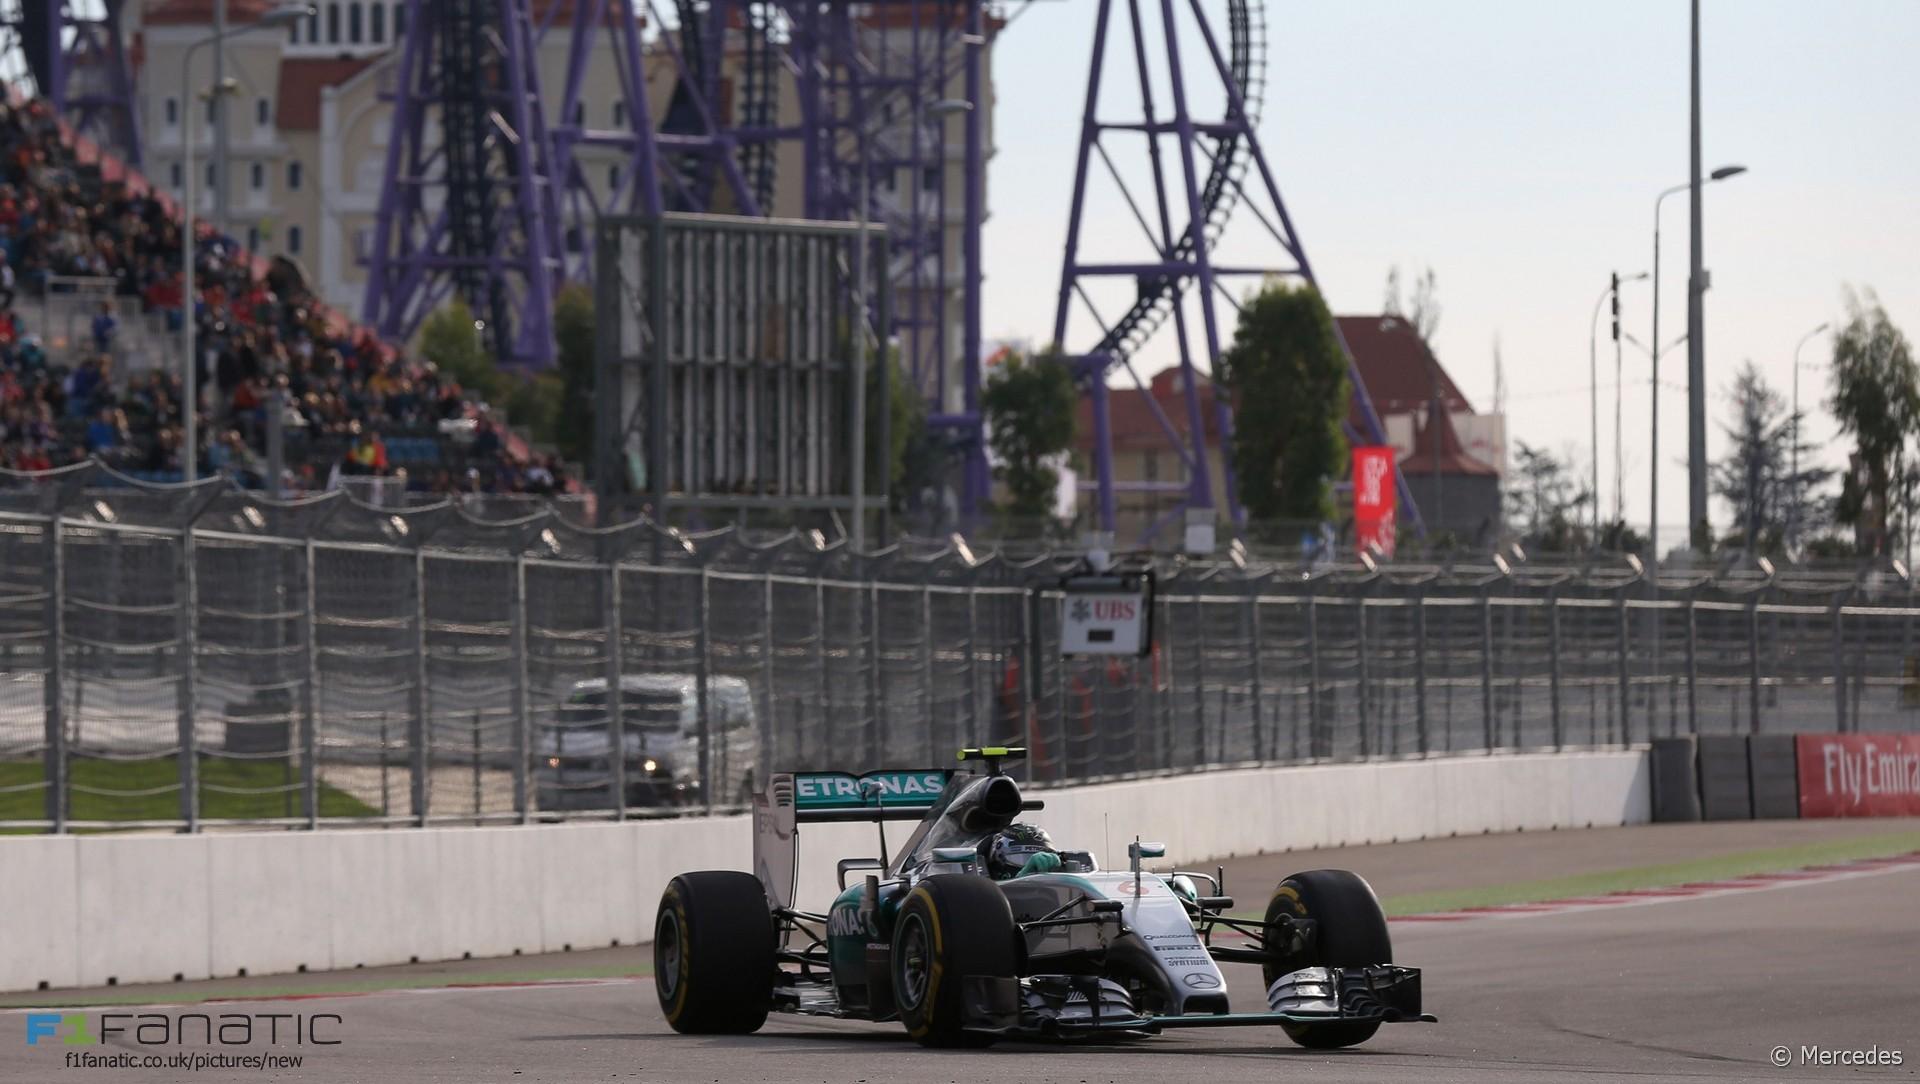 Nico Rosberg, Mercedes, Sochi Autodrom, 2015